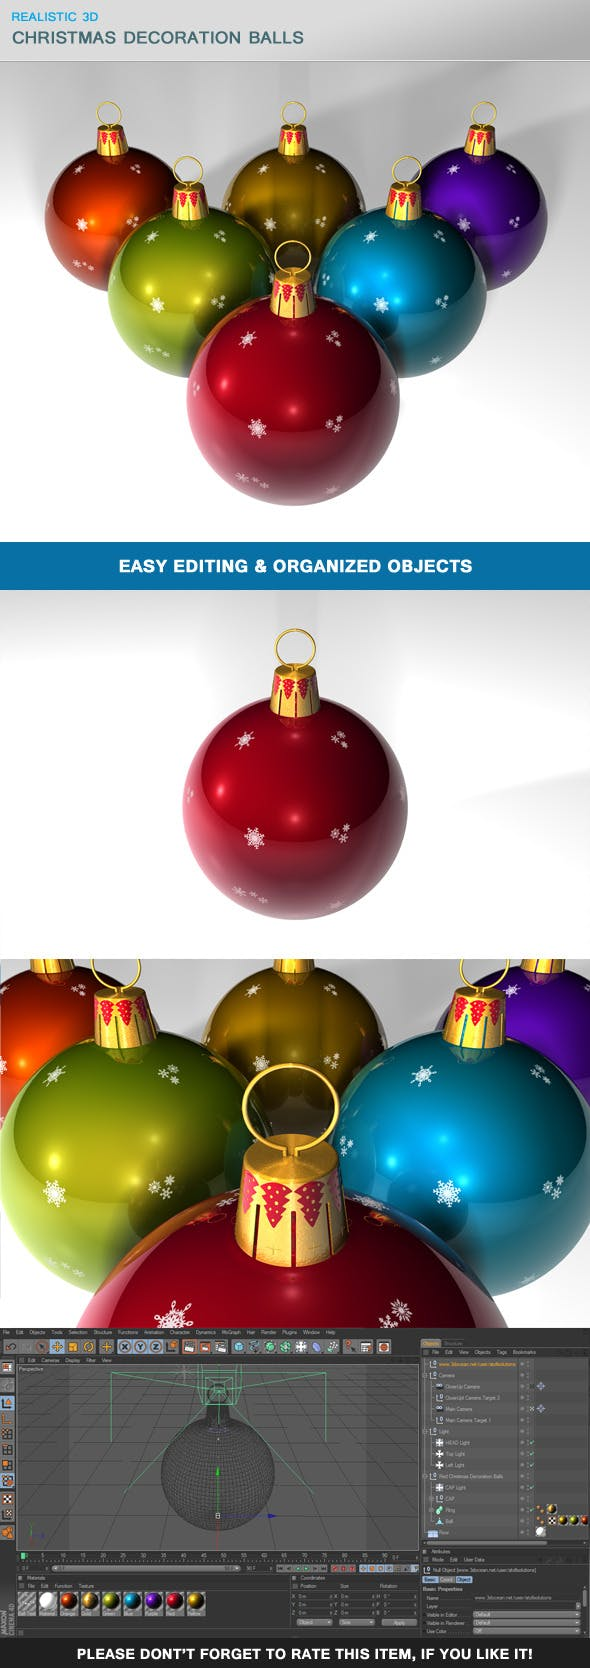 Christmas Decoration Balls - 3DOcean Item for Sale